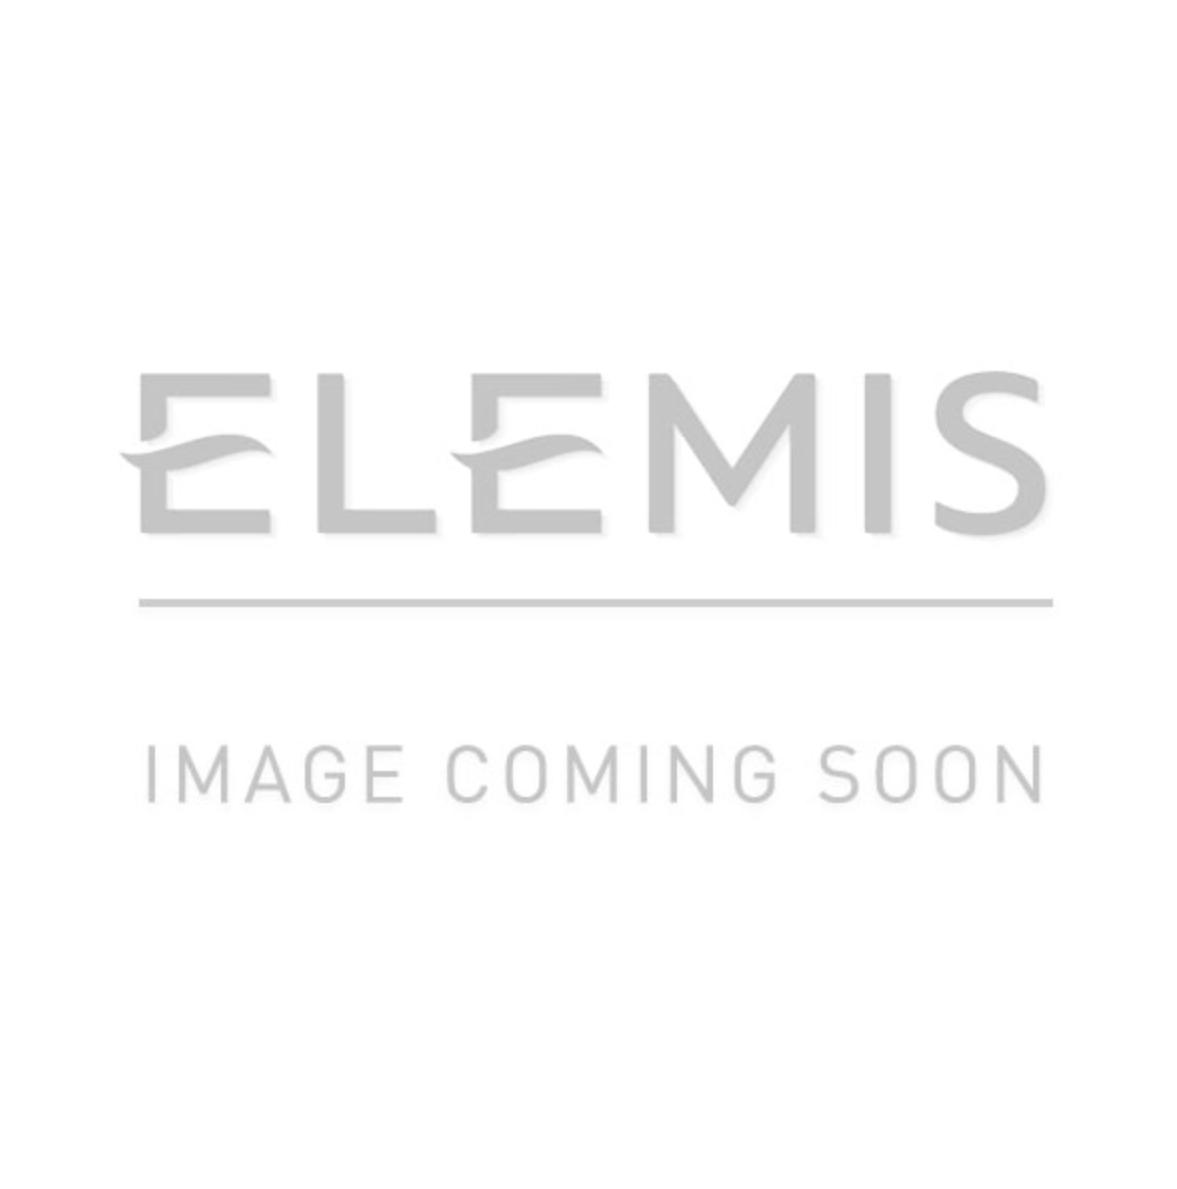 Elemis Travel Superfood Blackcurrant Jelly Exfoliator 15ml